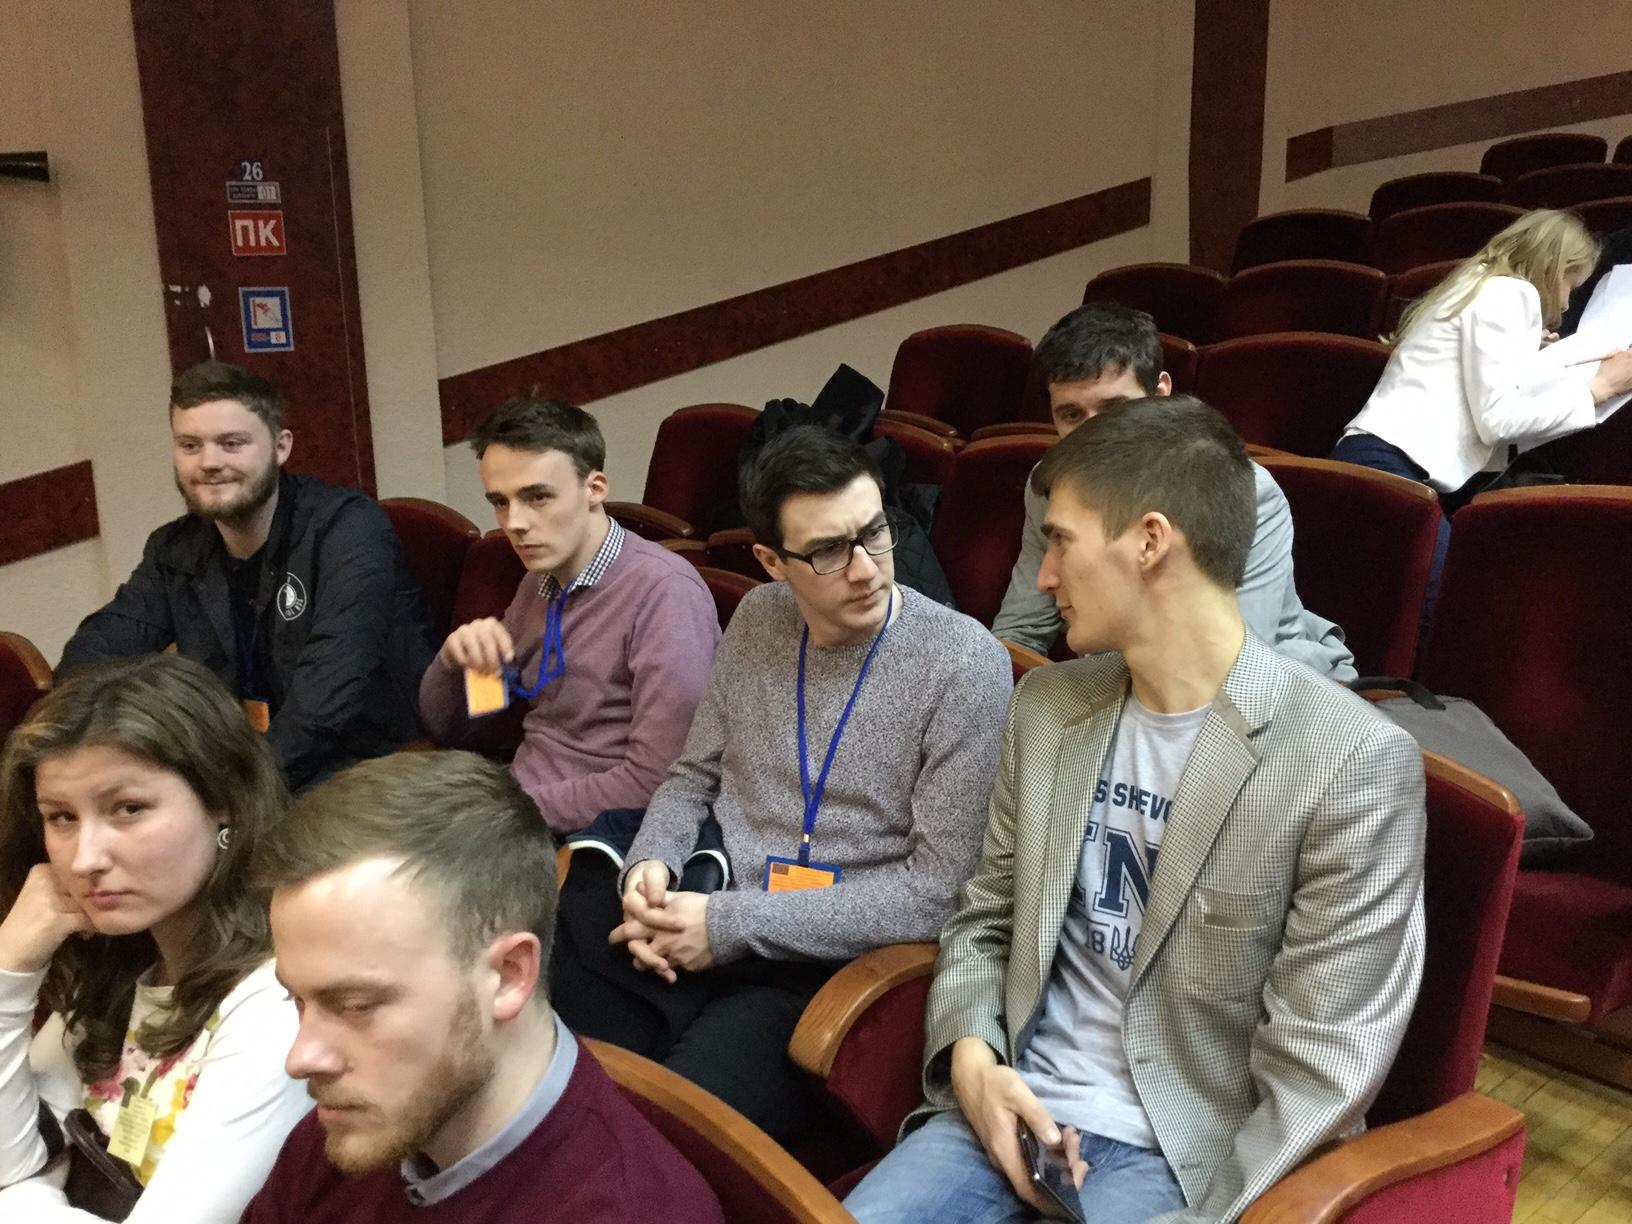 Day 1 Northumbria Student Union Team